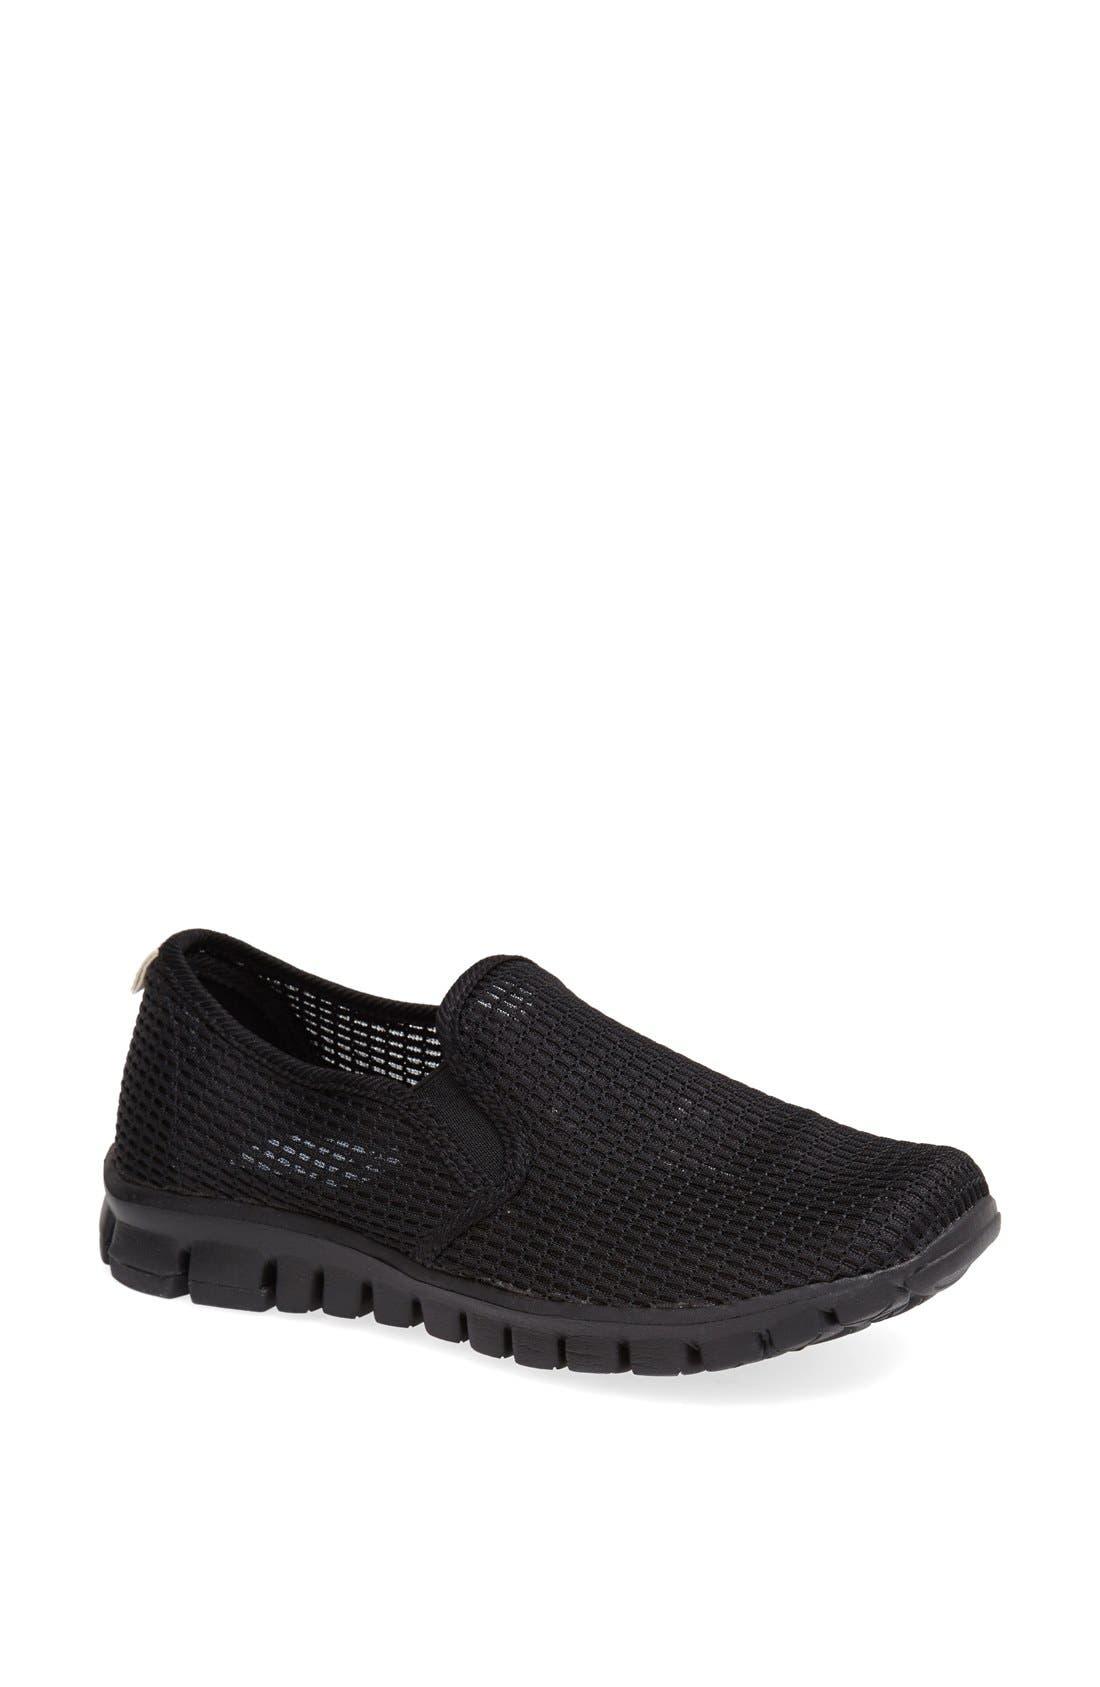 'Wino' Mesh Slip-On Sneaker, Main, color, 001